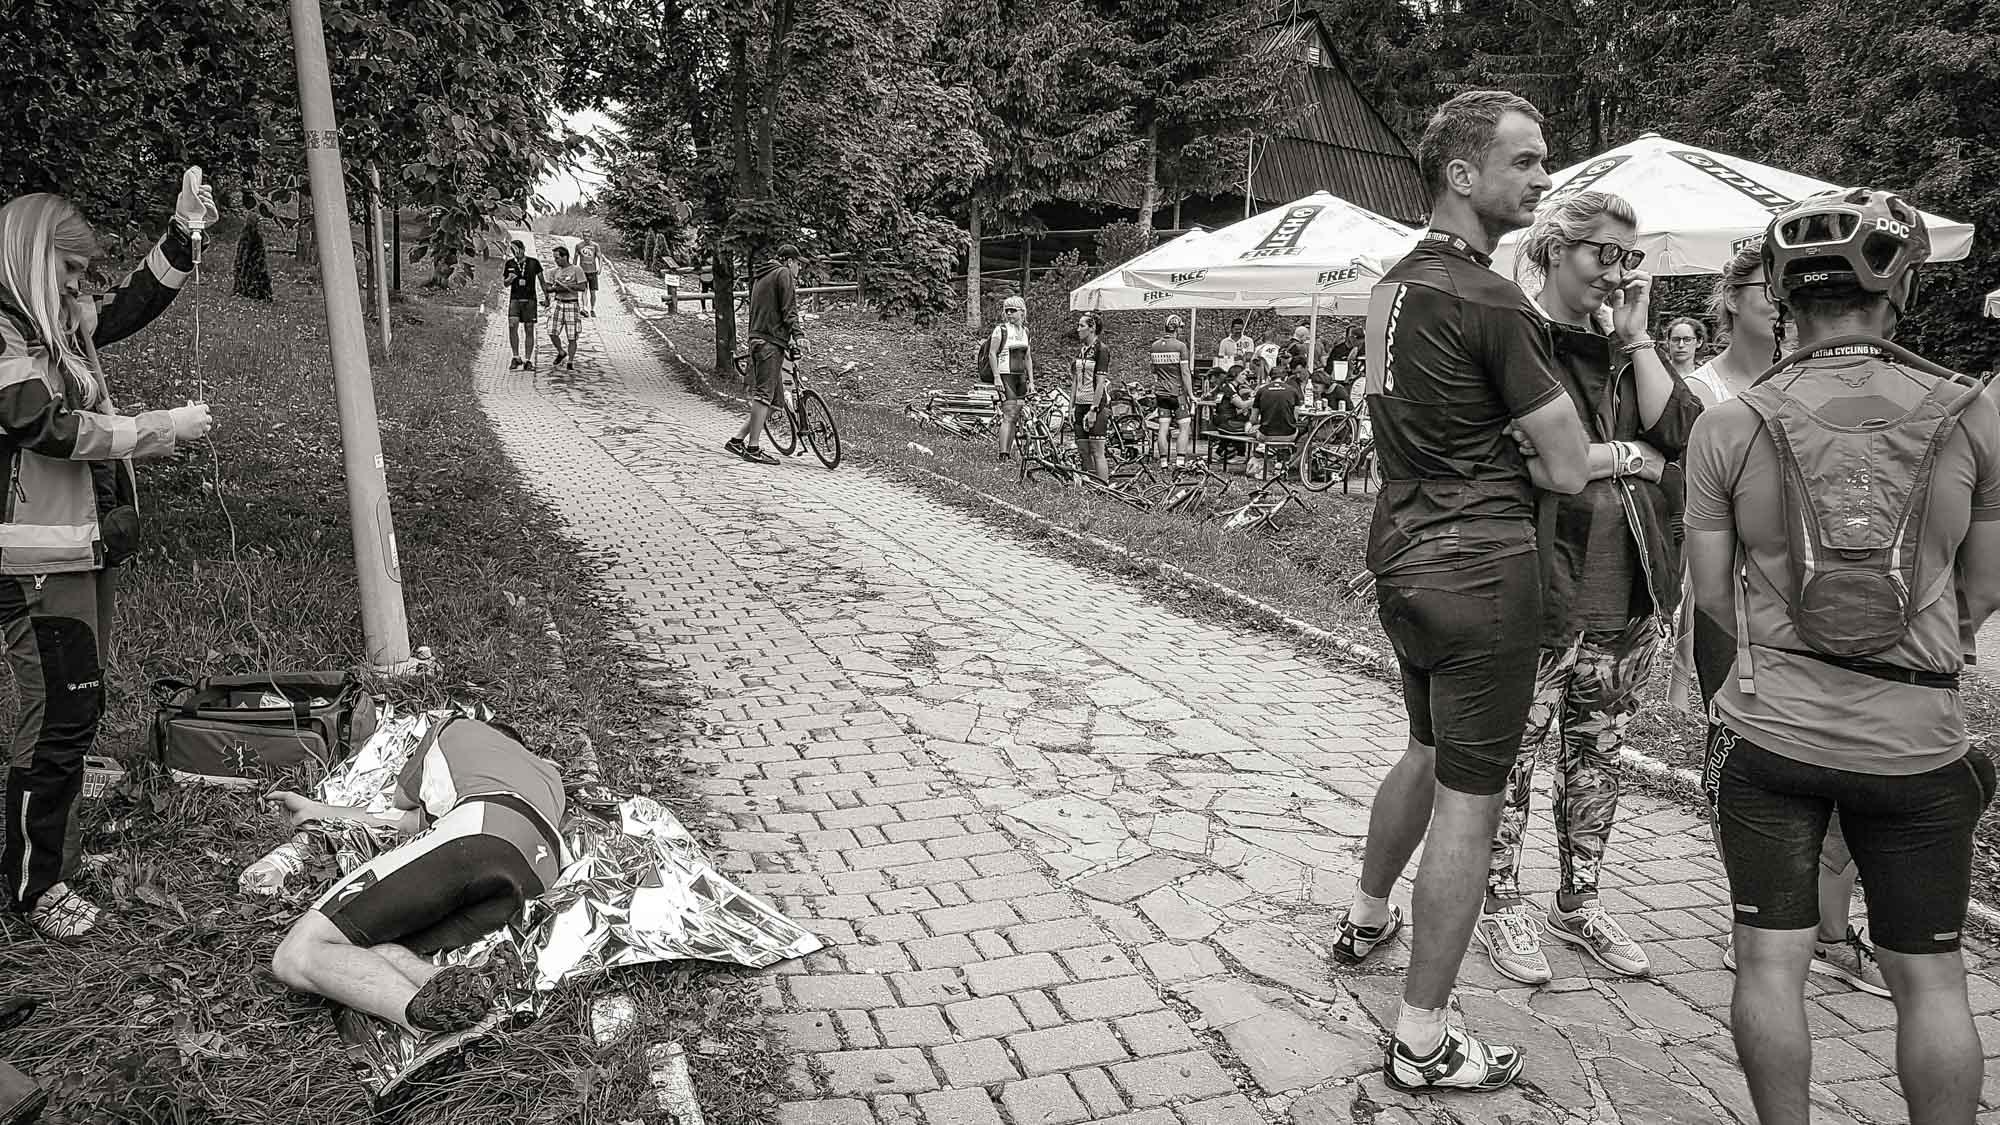 tatra road race